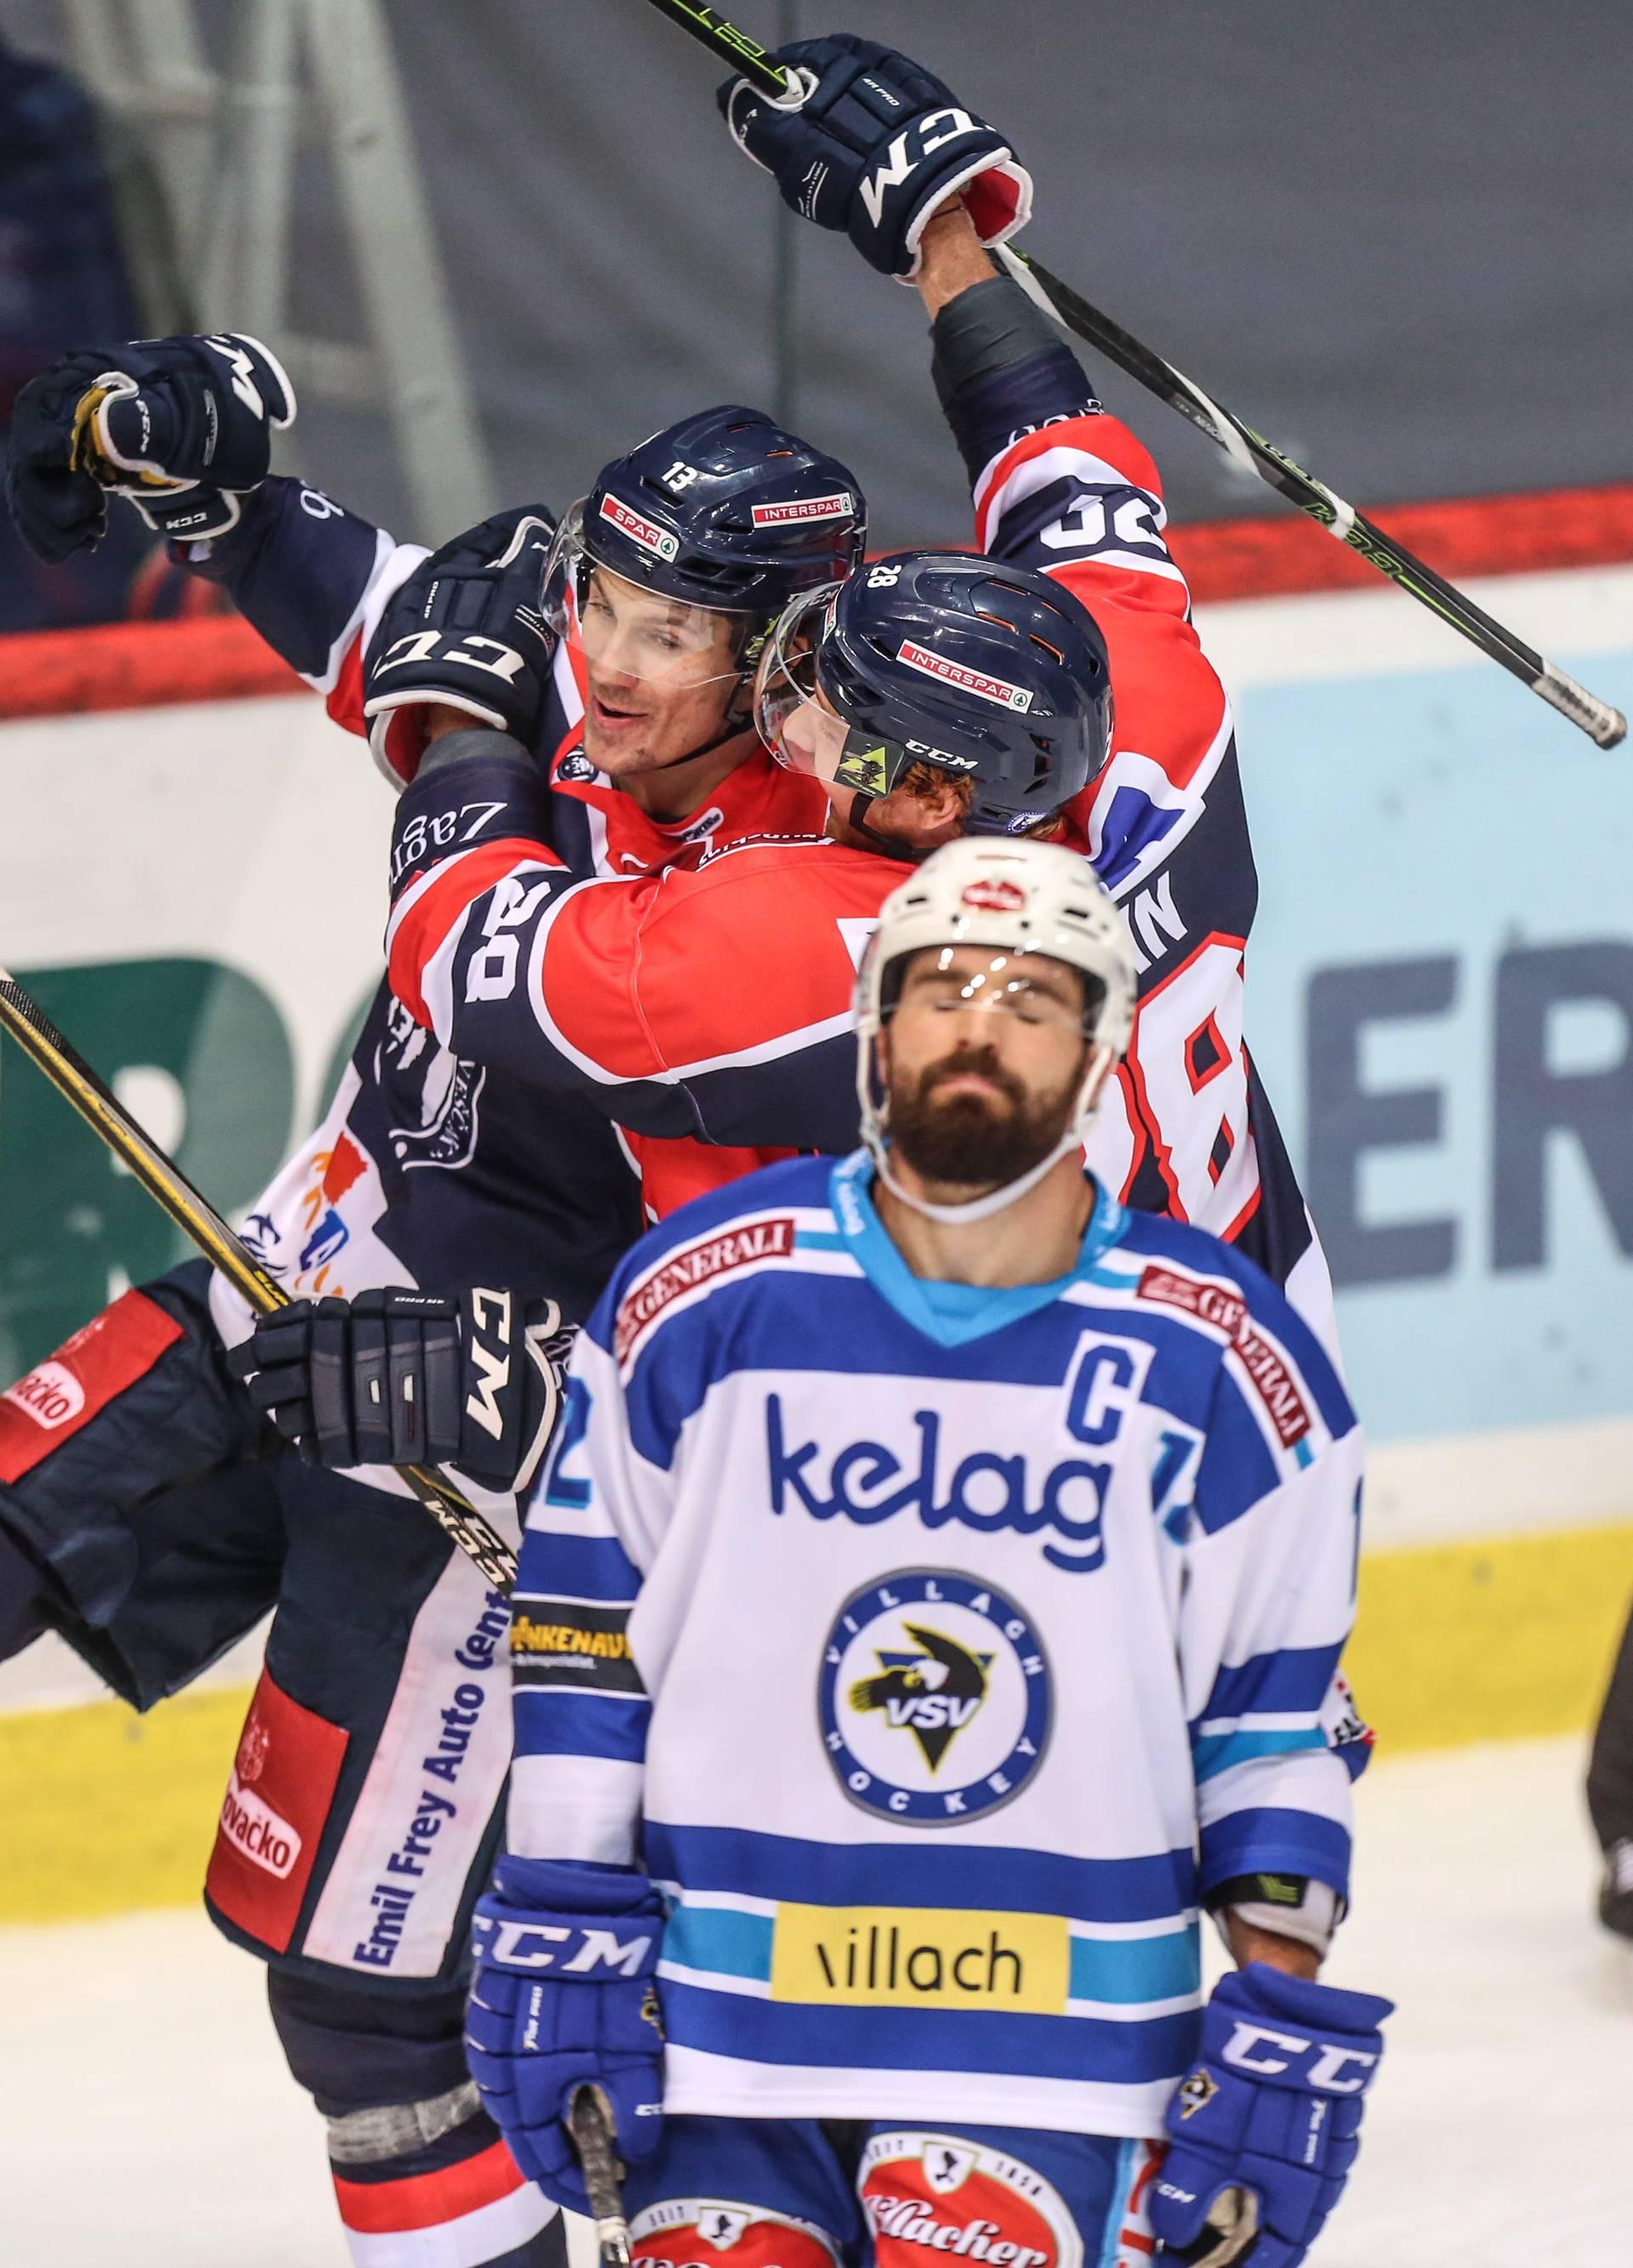 KHL Medvescak - EC VSV